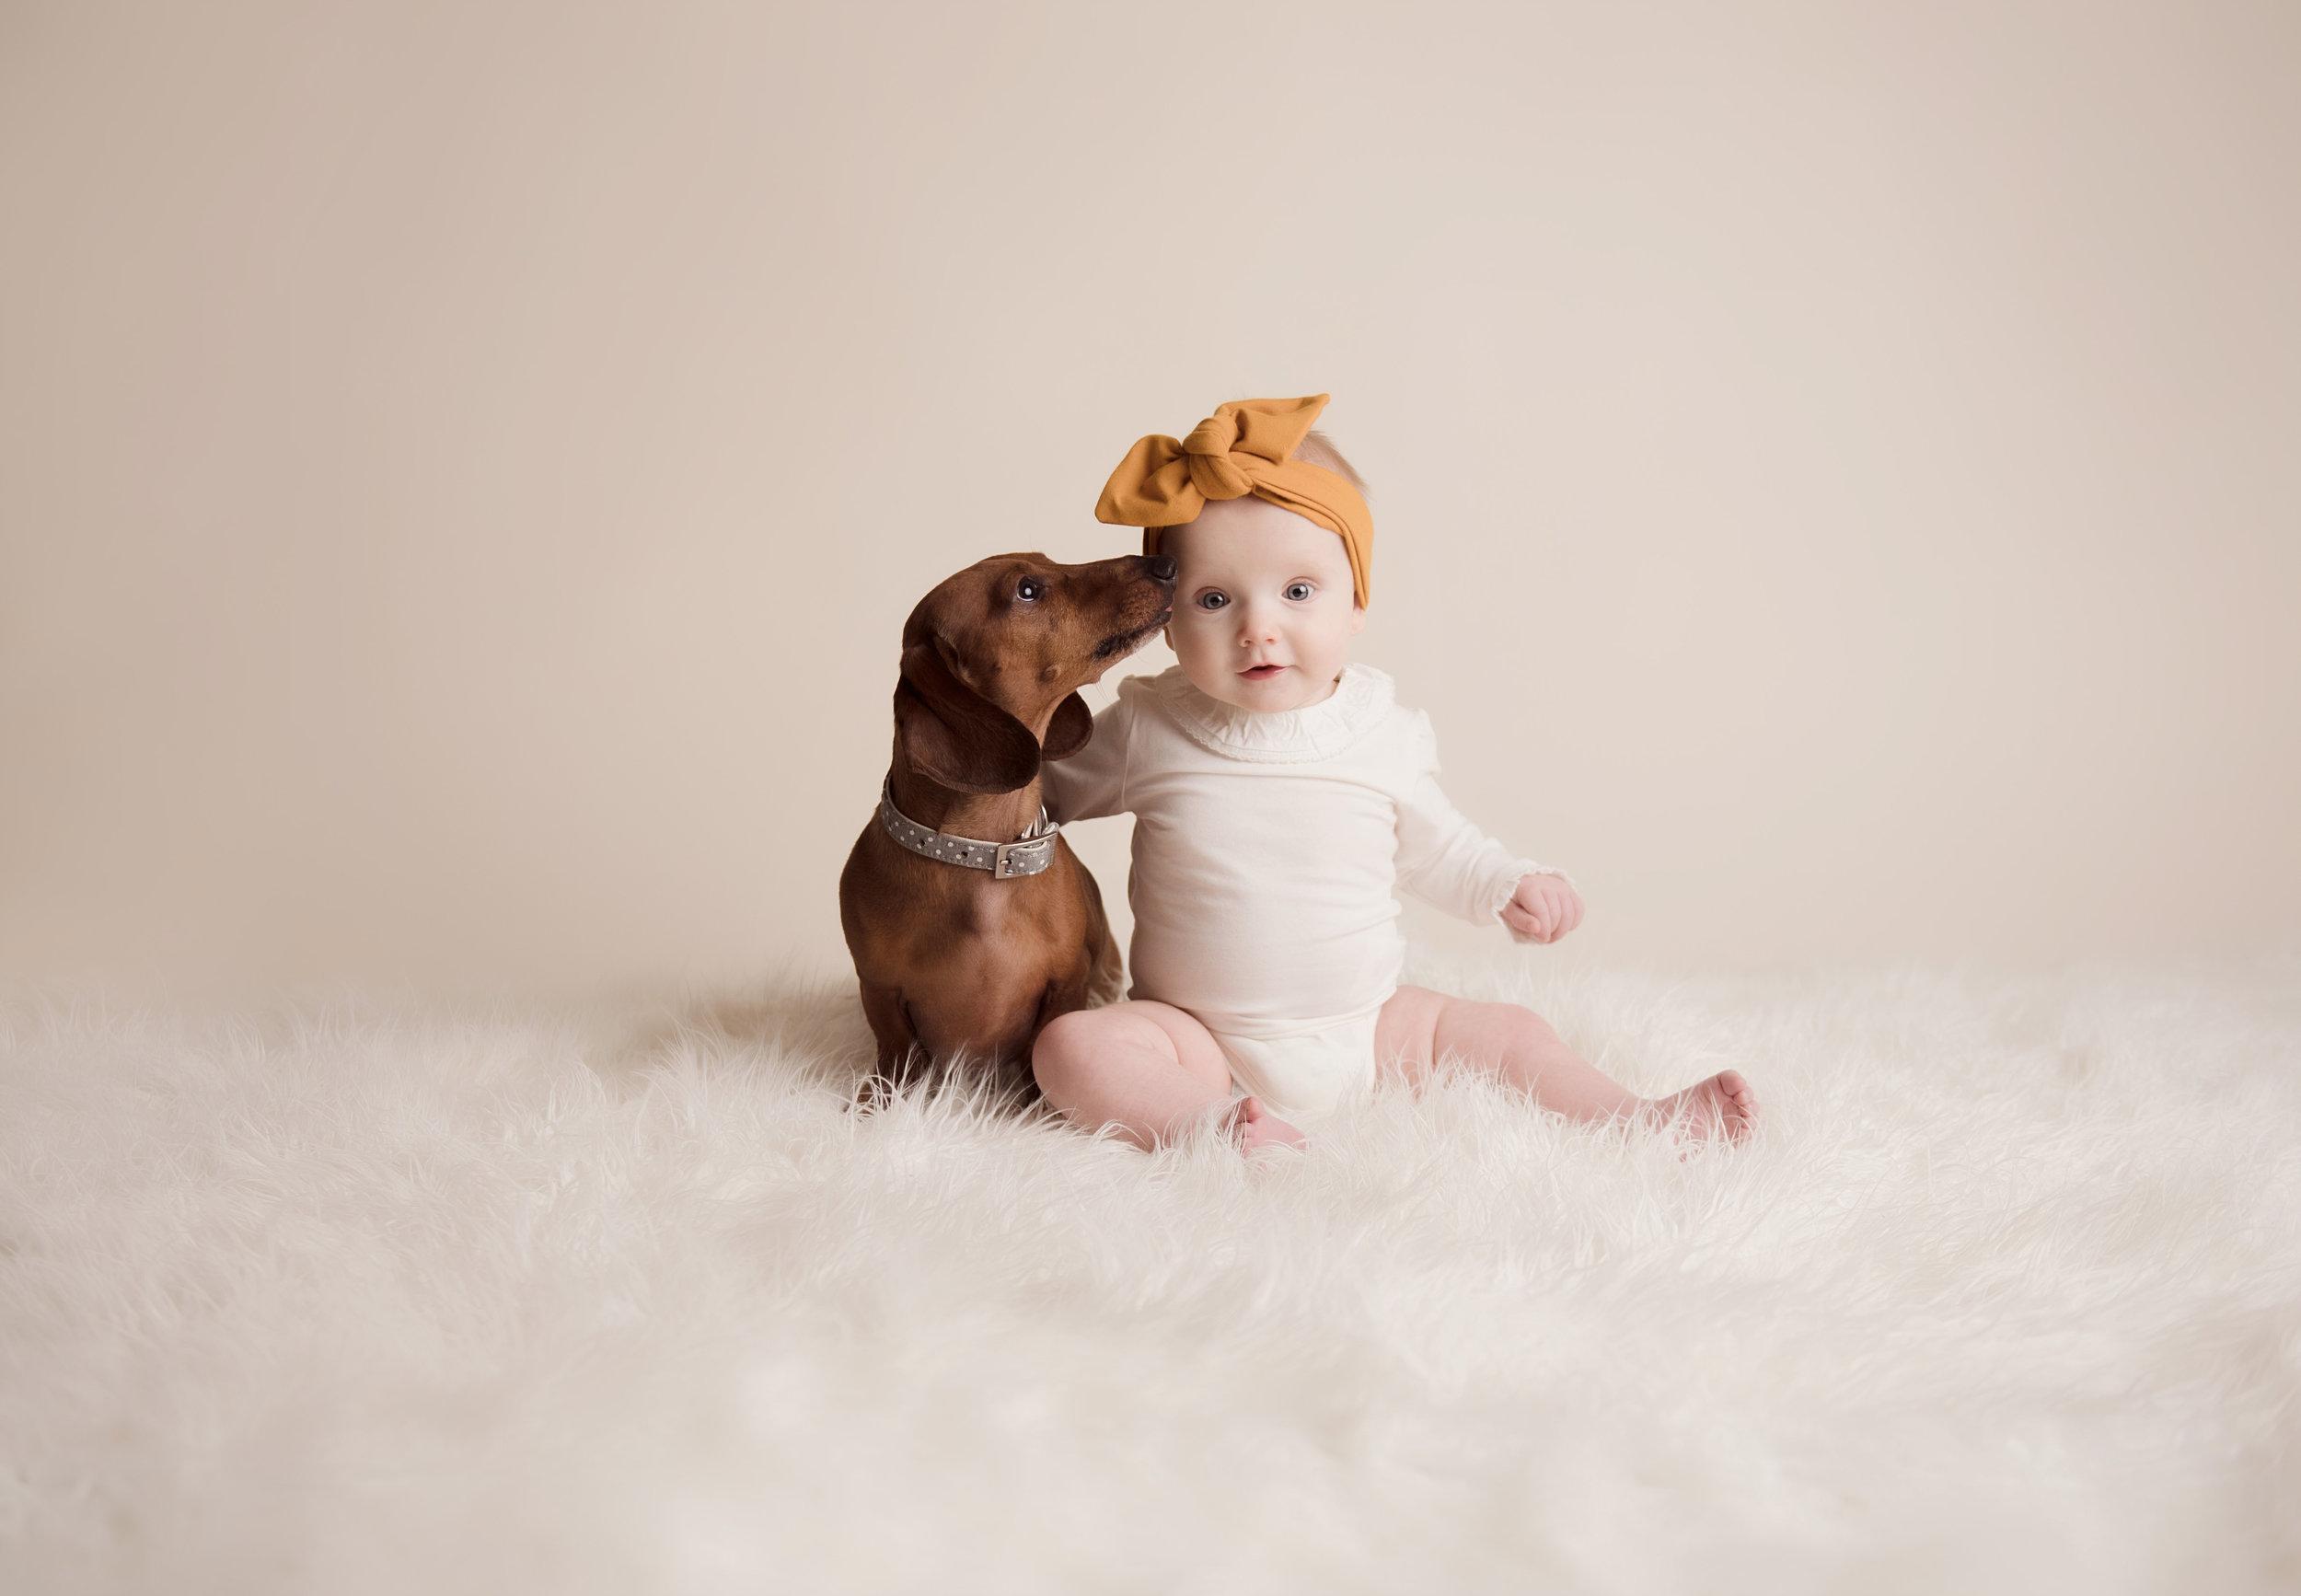 Bozeman-Billings-Montana-Tina-Stinson-Photography-kids-photographer-baby-2974.jpg